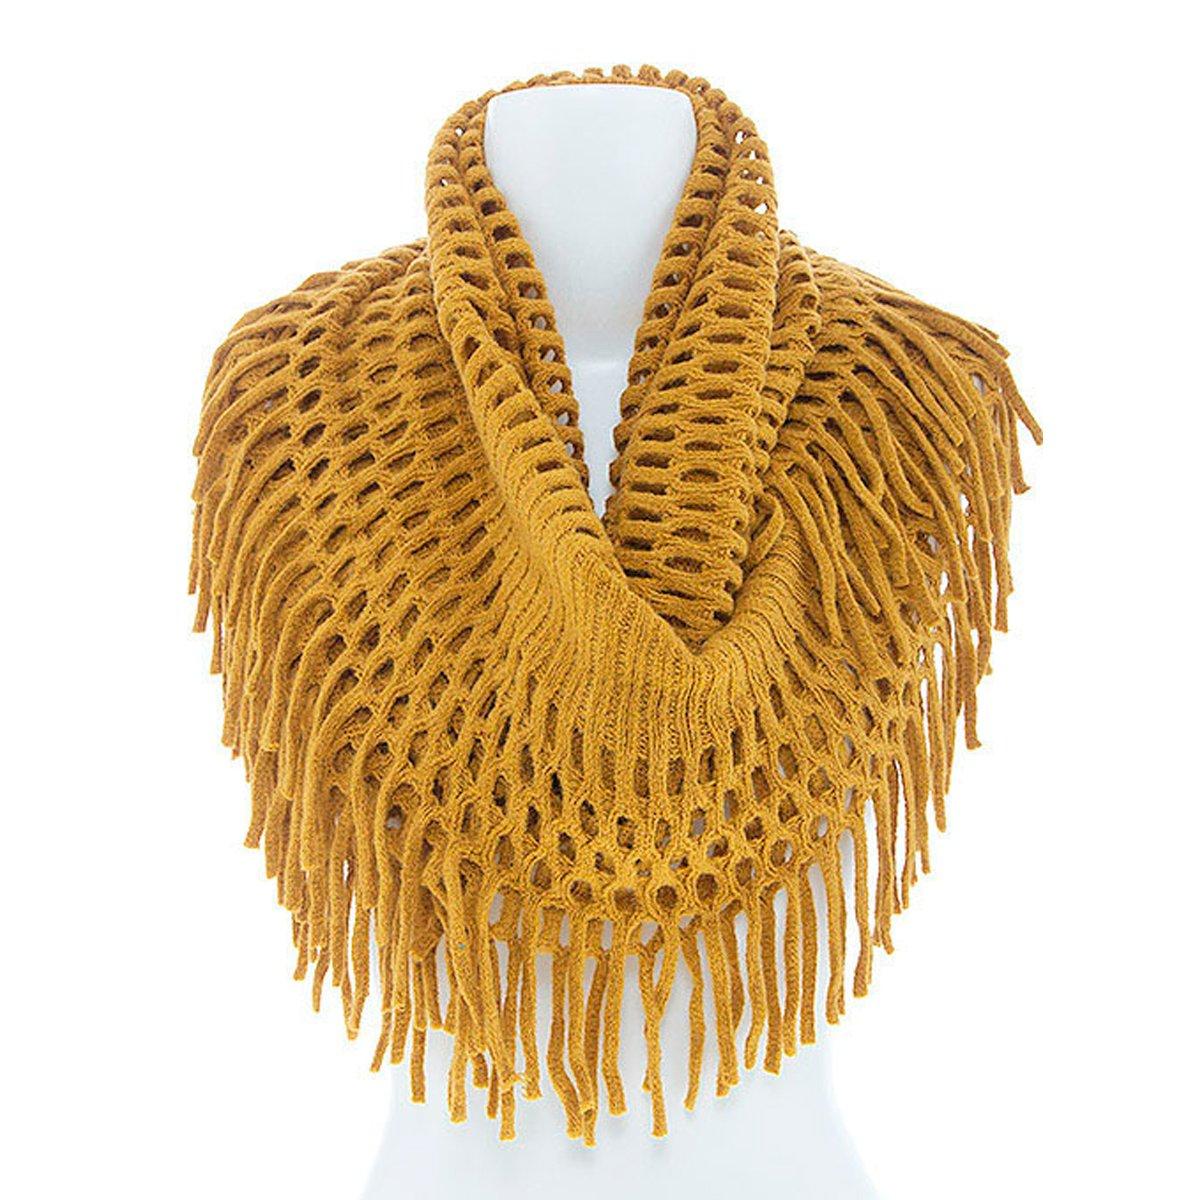 Women's Winter Warm Knit Infinity Fringed Scarf, Multiple Colors (Mustard)